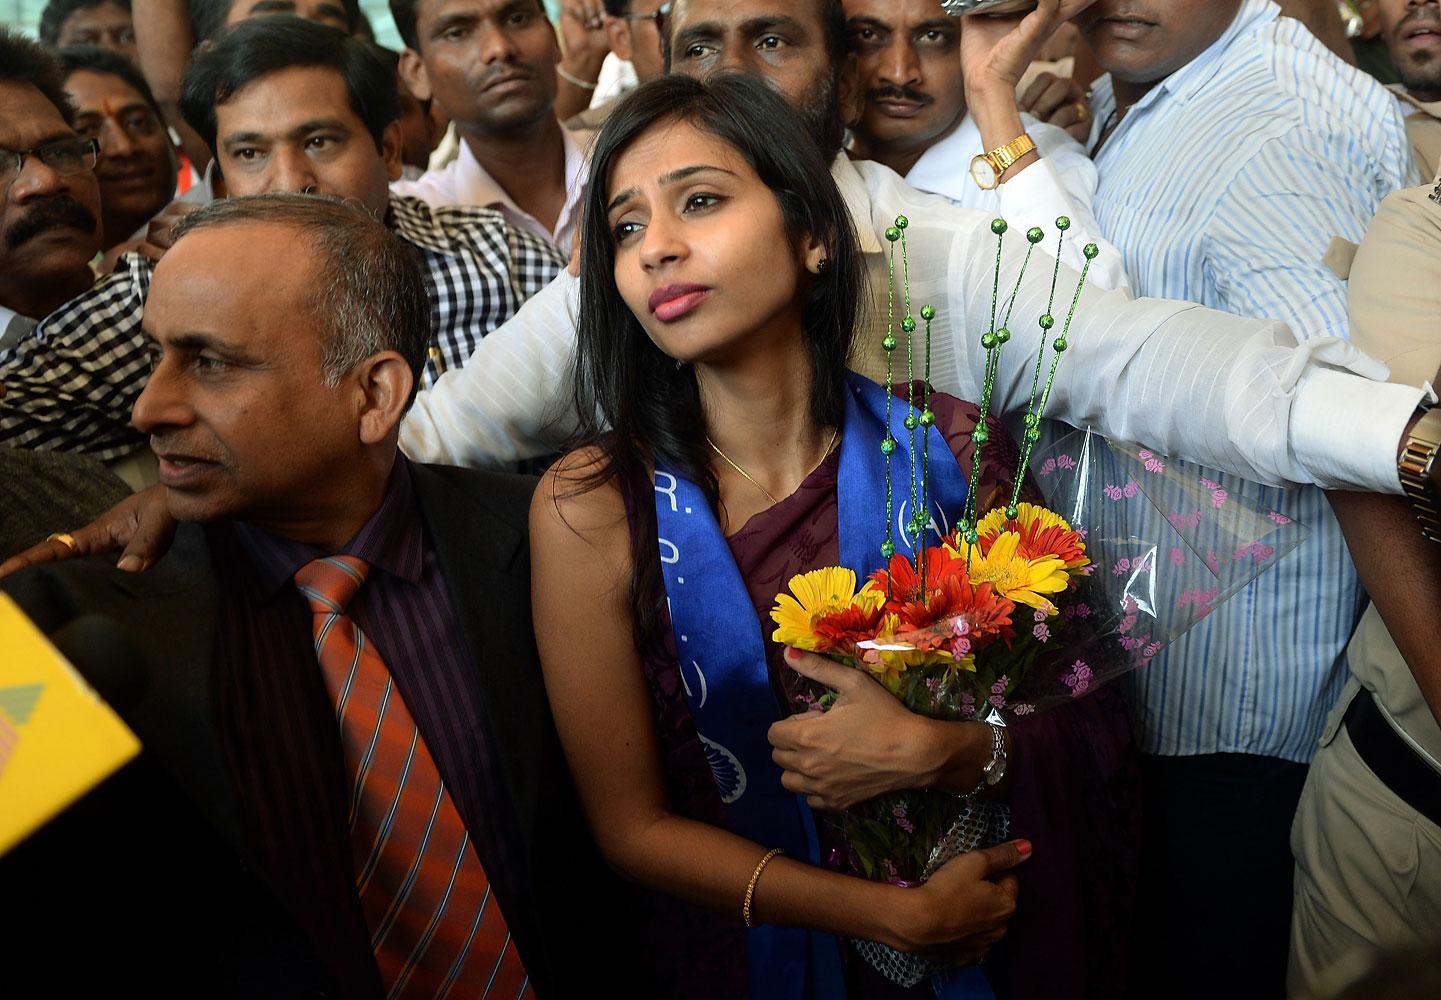 Indian diplomat Devyani Khobragade, center, accompanied by her father Uttam Khobragade, arrives at the domestic airport in Mumbai on Jan. 14, 2014.